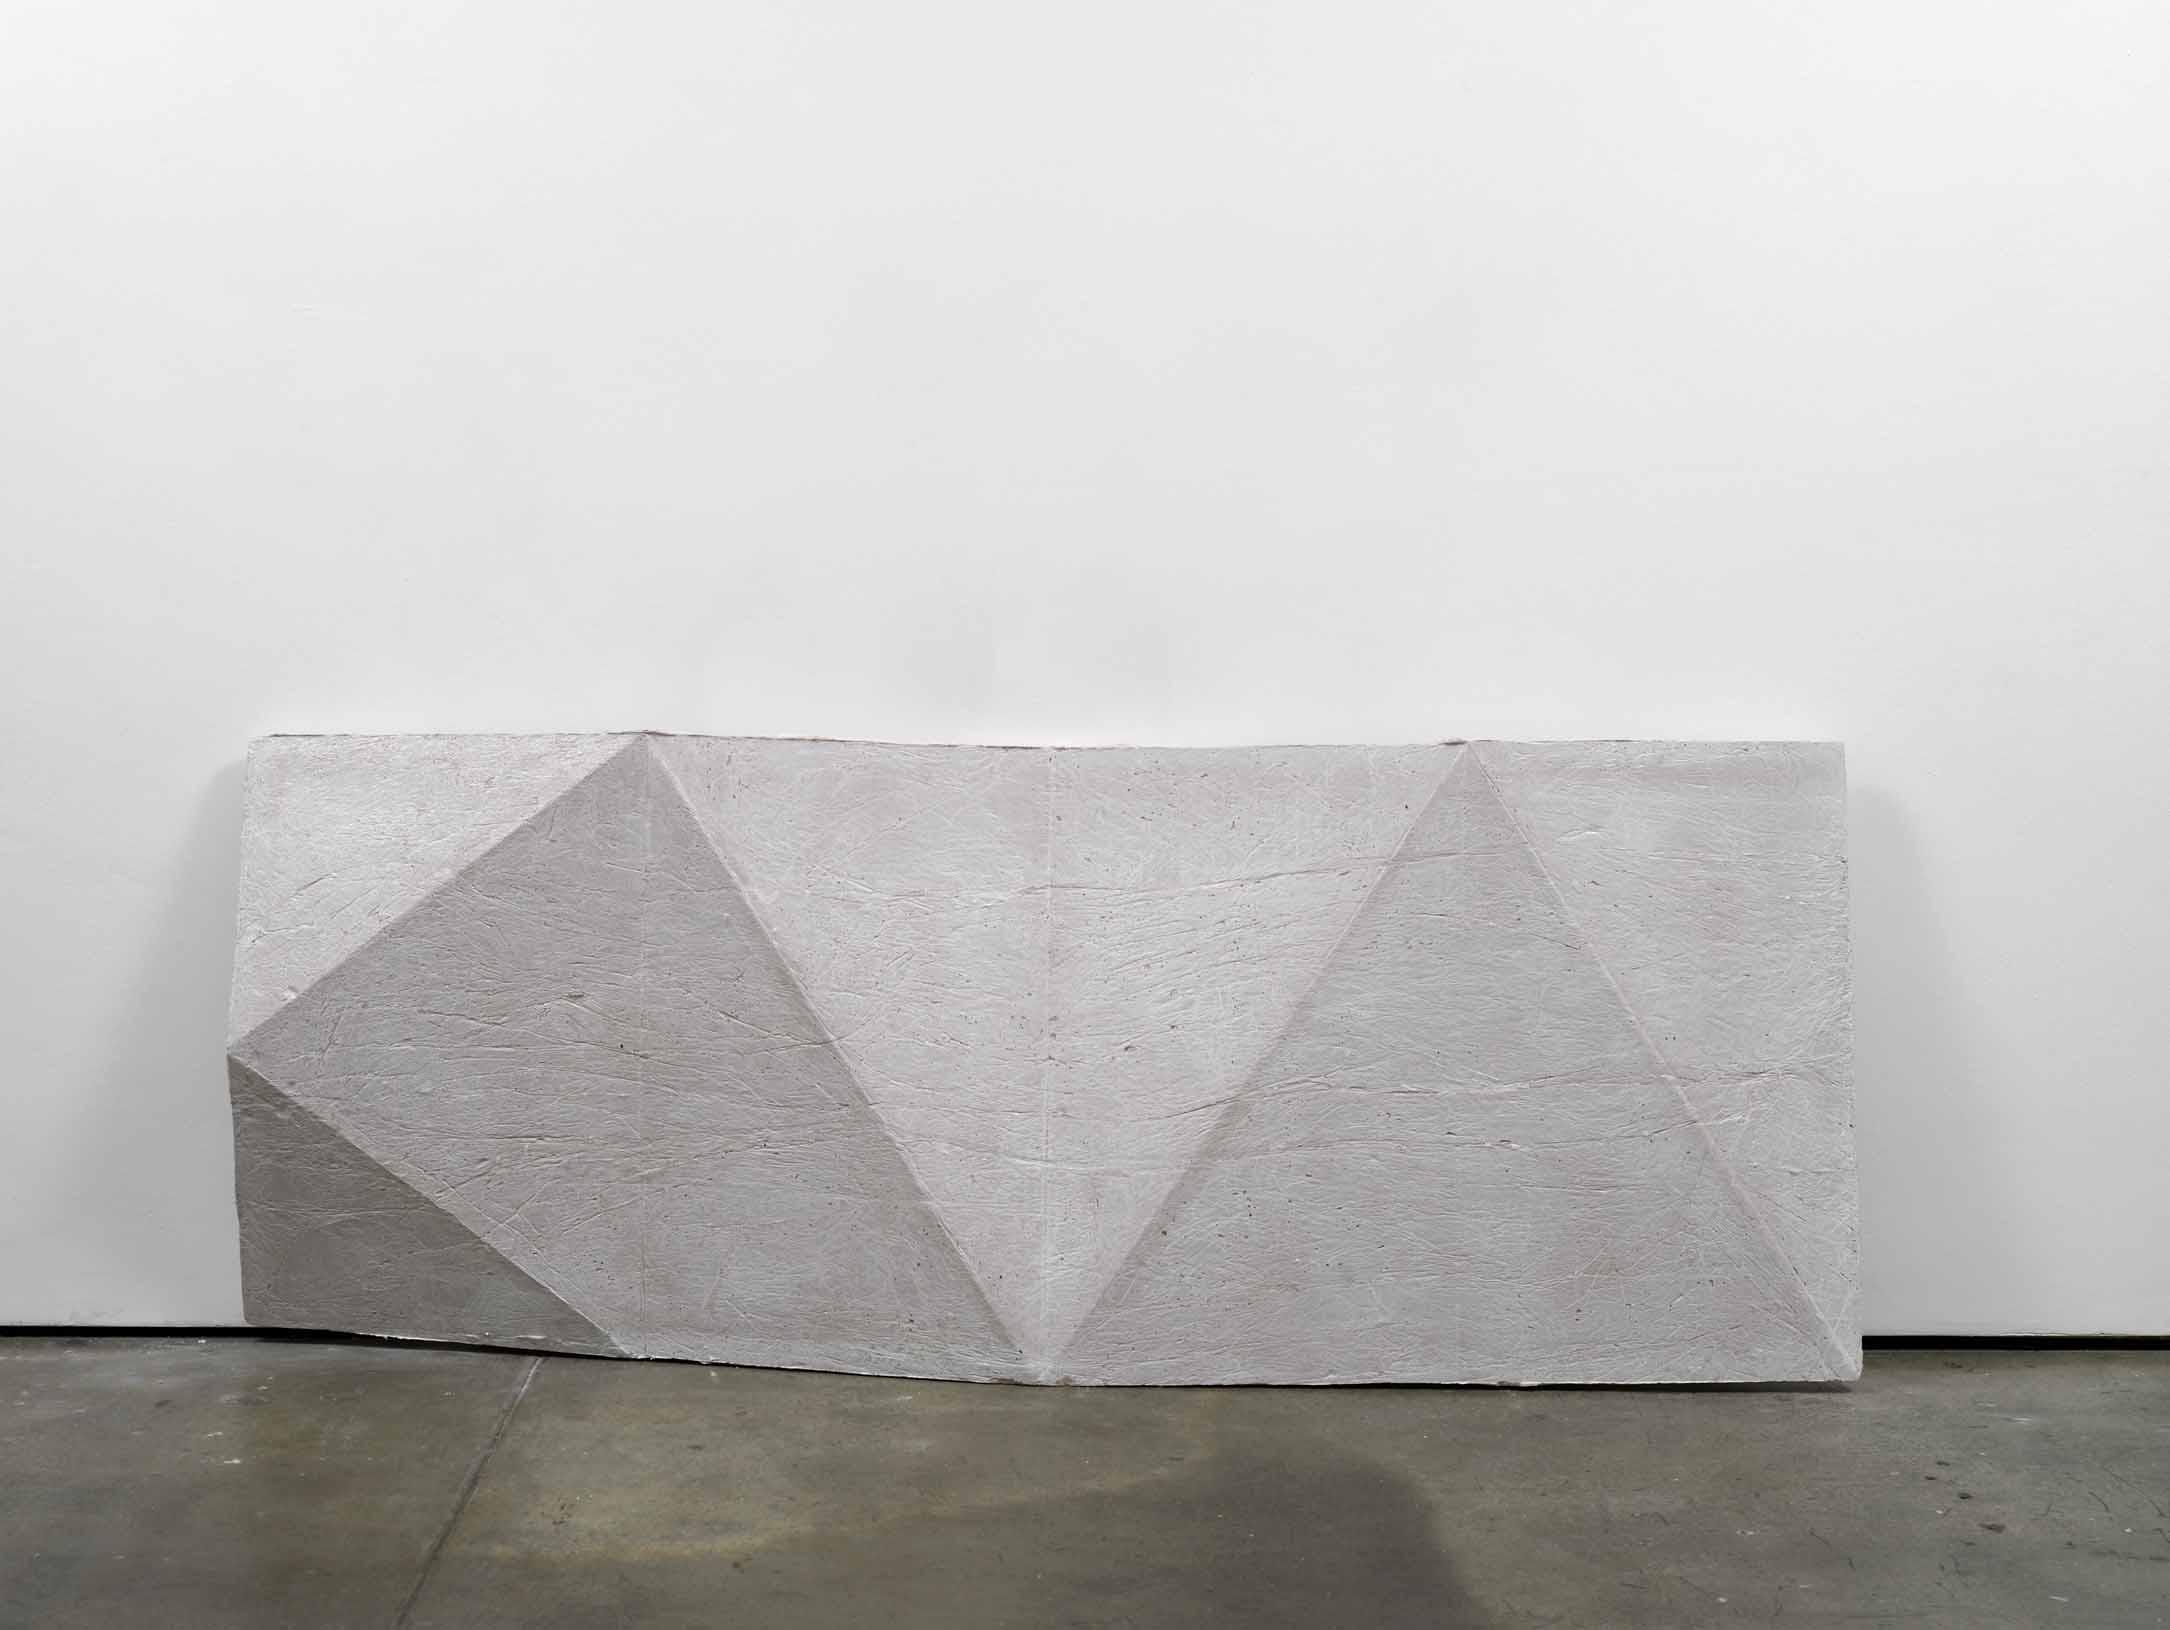 cope (working title) 2011 Concrete 77 x 200 x 13 cm / 30.3 x 78.7 x 5 in